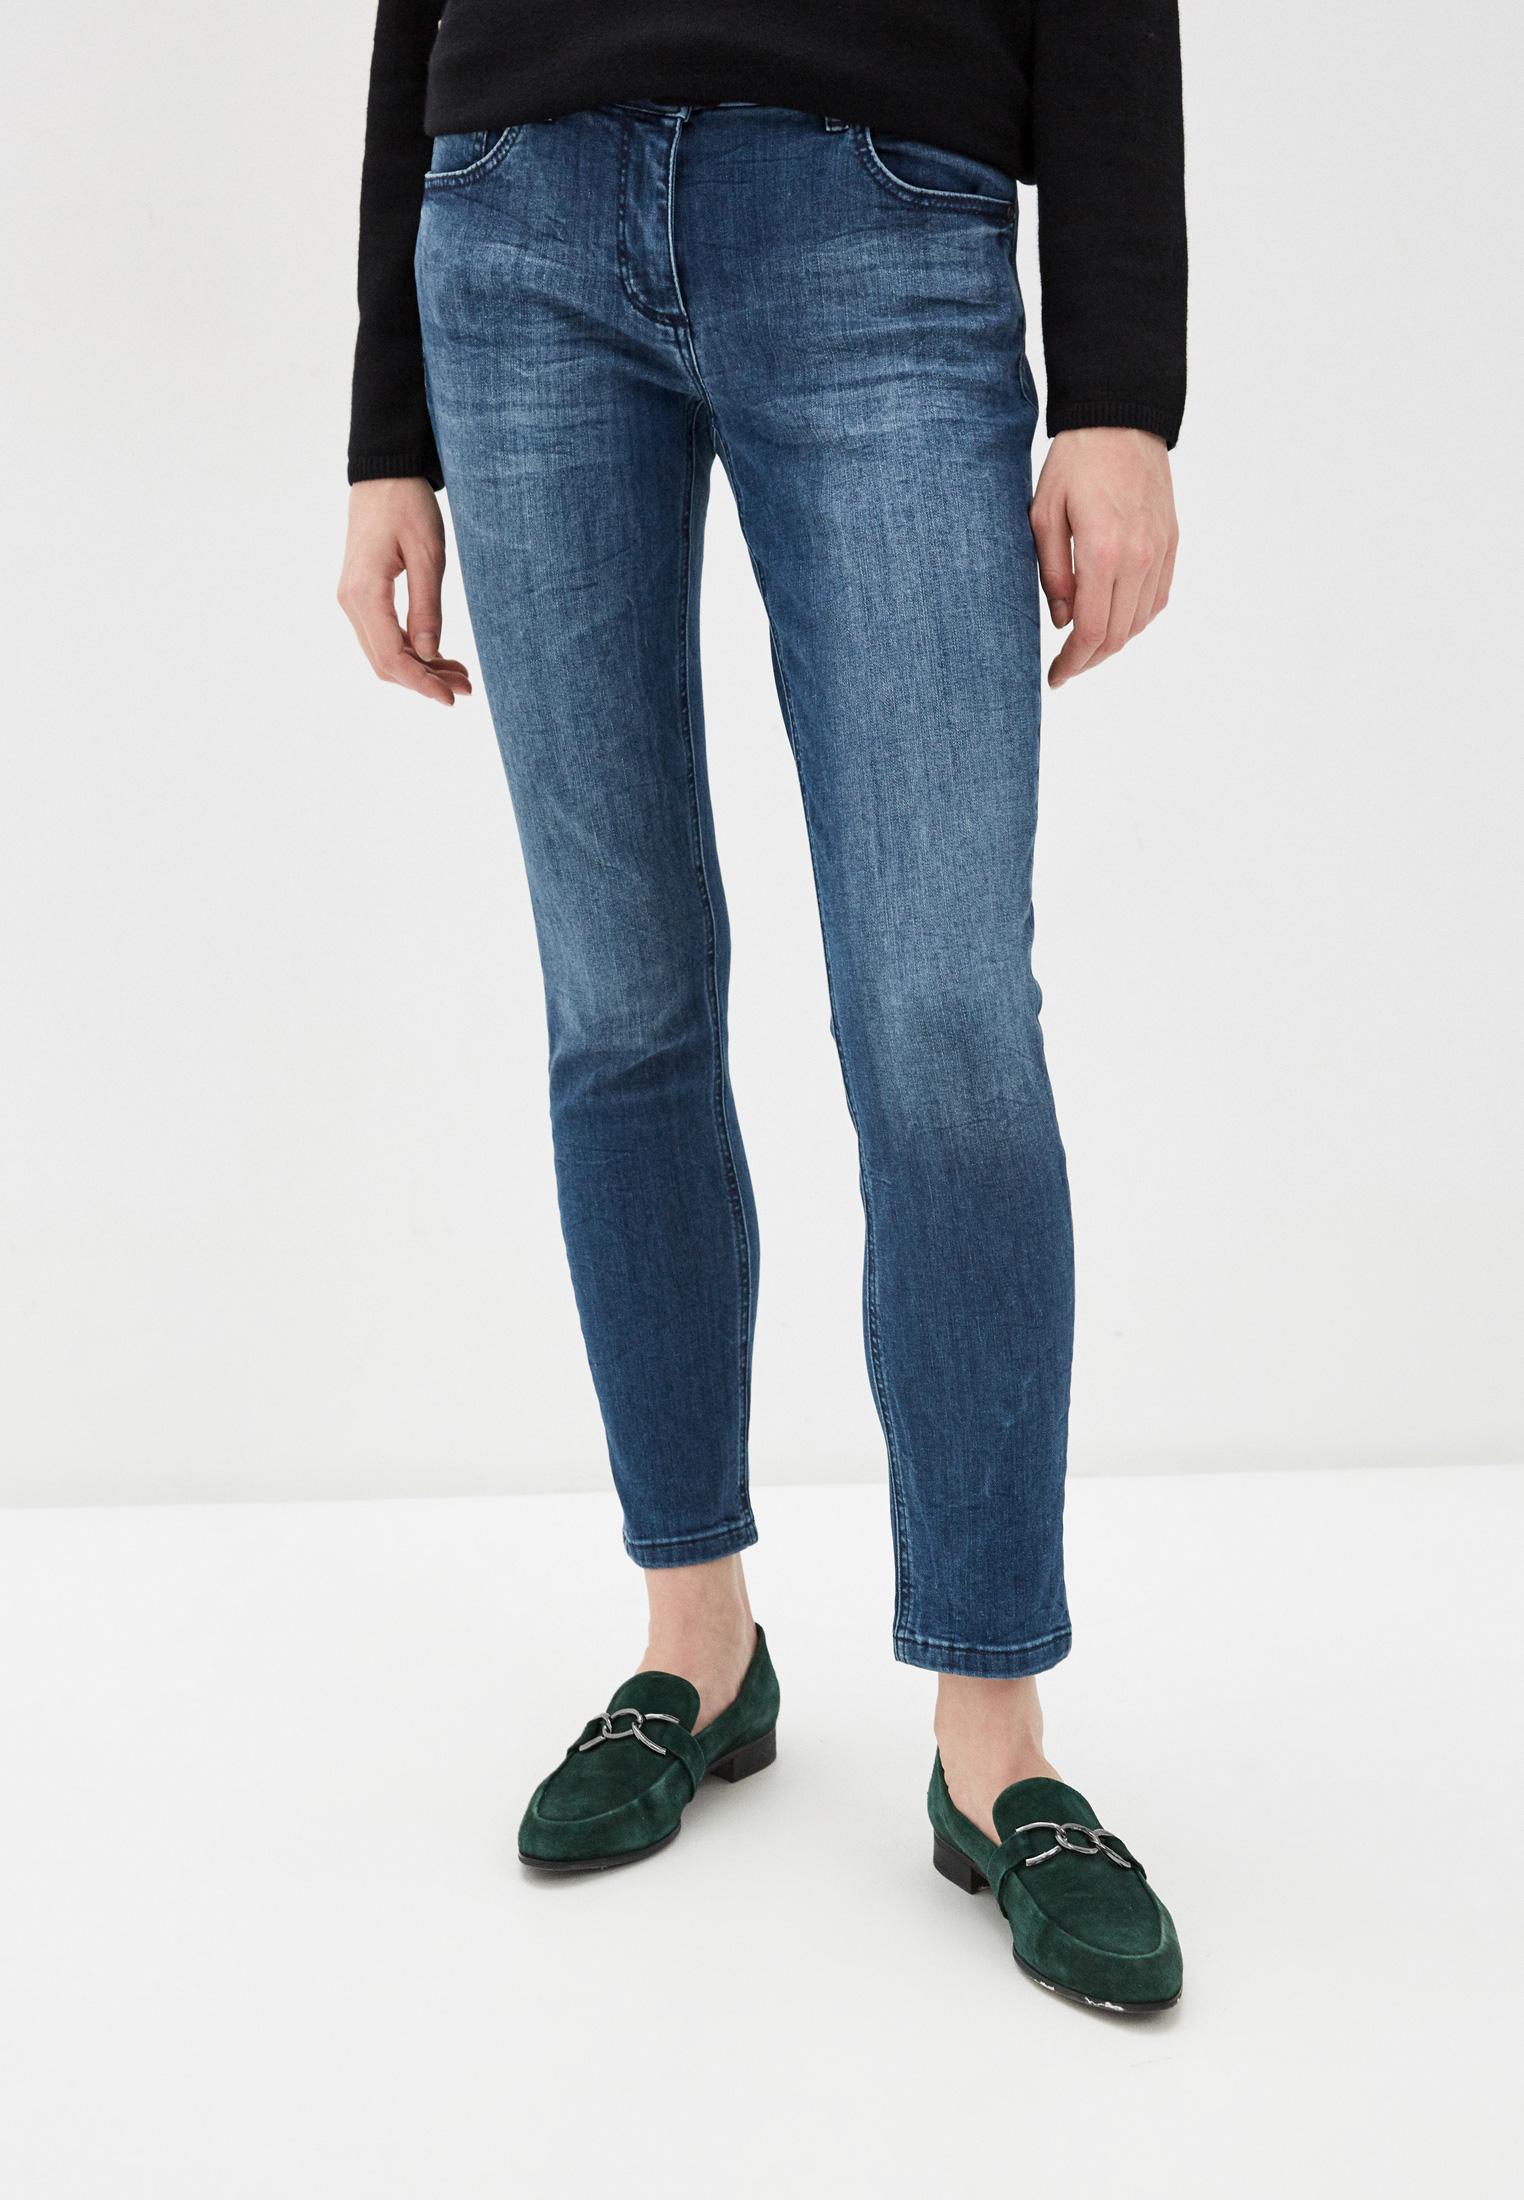 Женские джинсы Betty Barclay 6005/1065